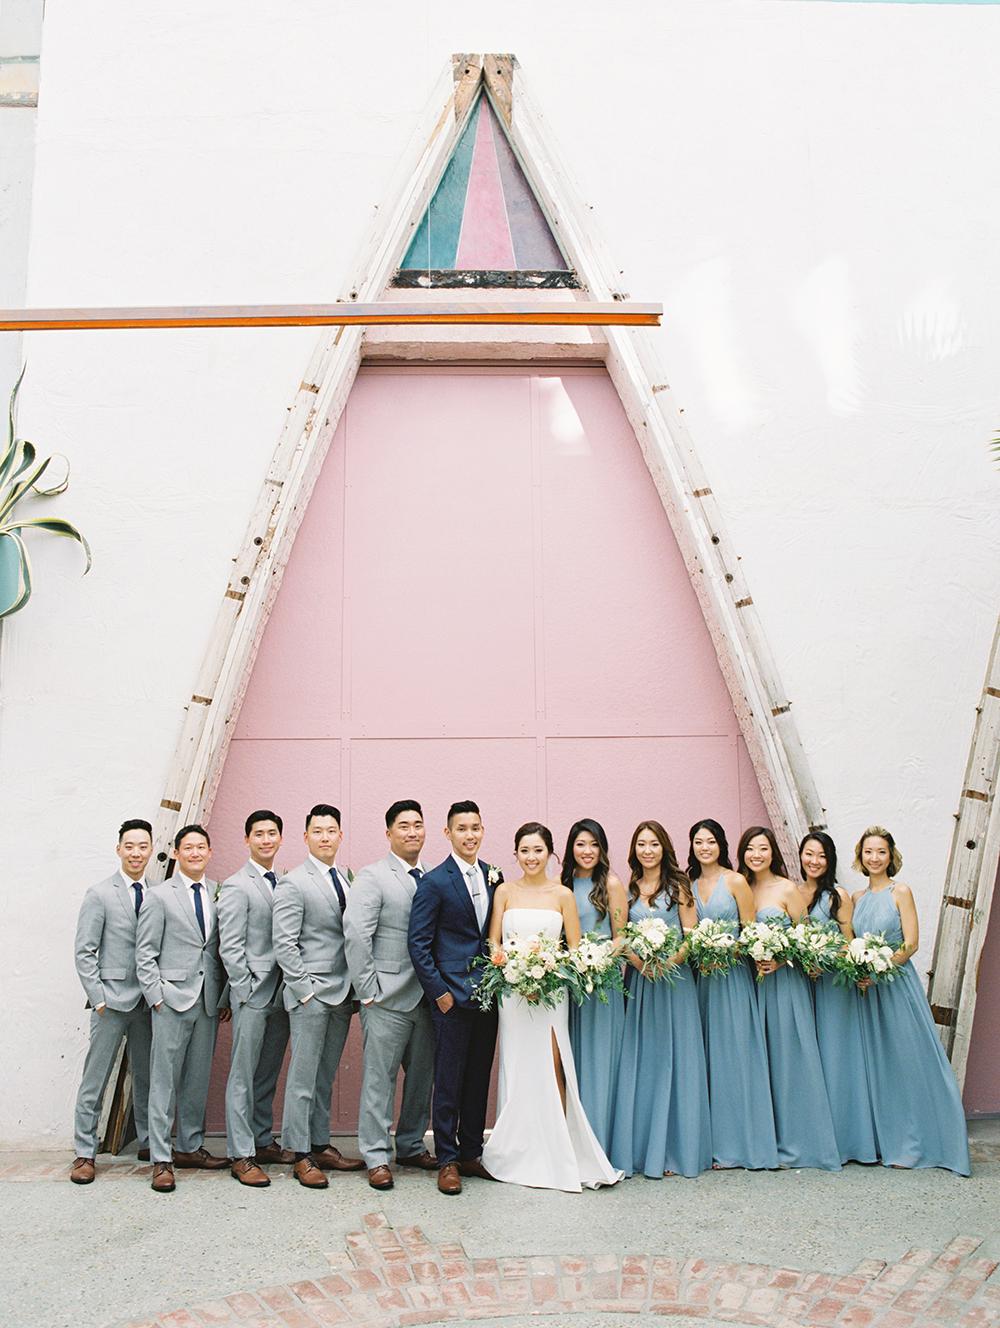 e5f767360ef25 Sylvia and Josh's wedding at The Grass Room | Grey Likes Weddings |  Bloglovin'